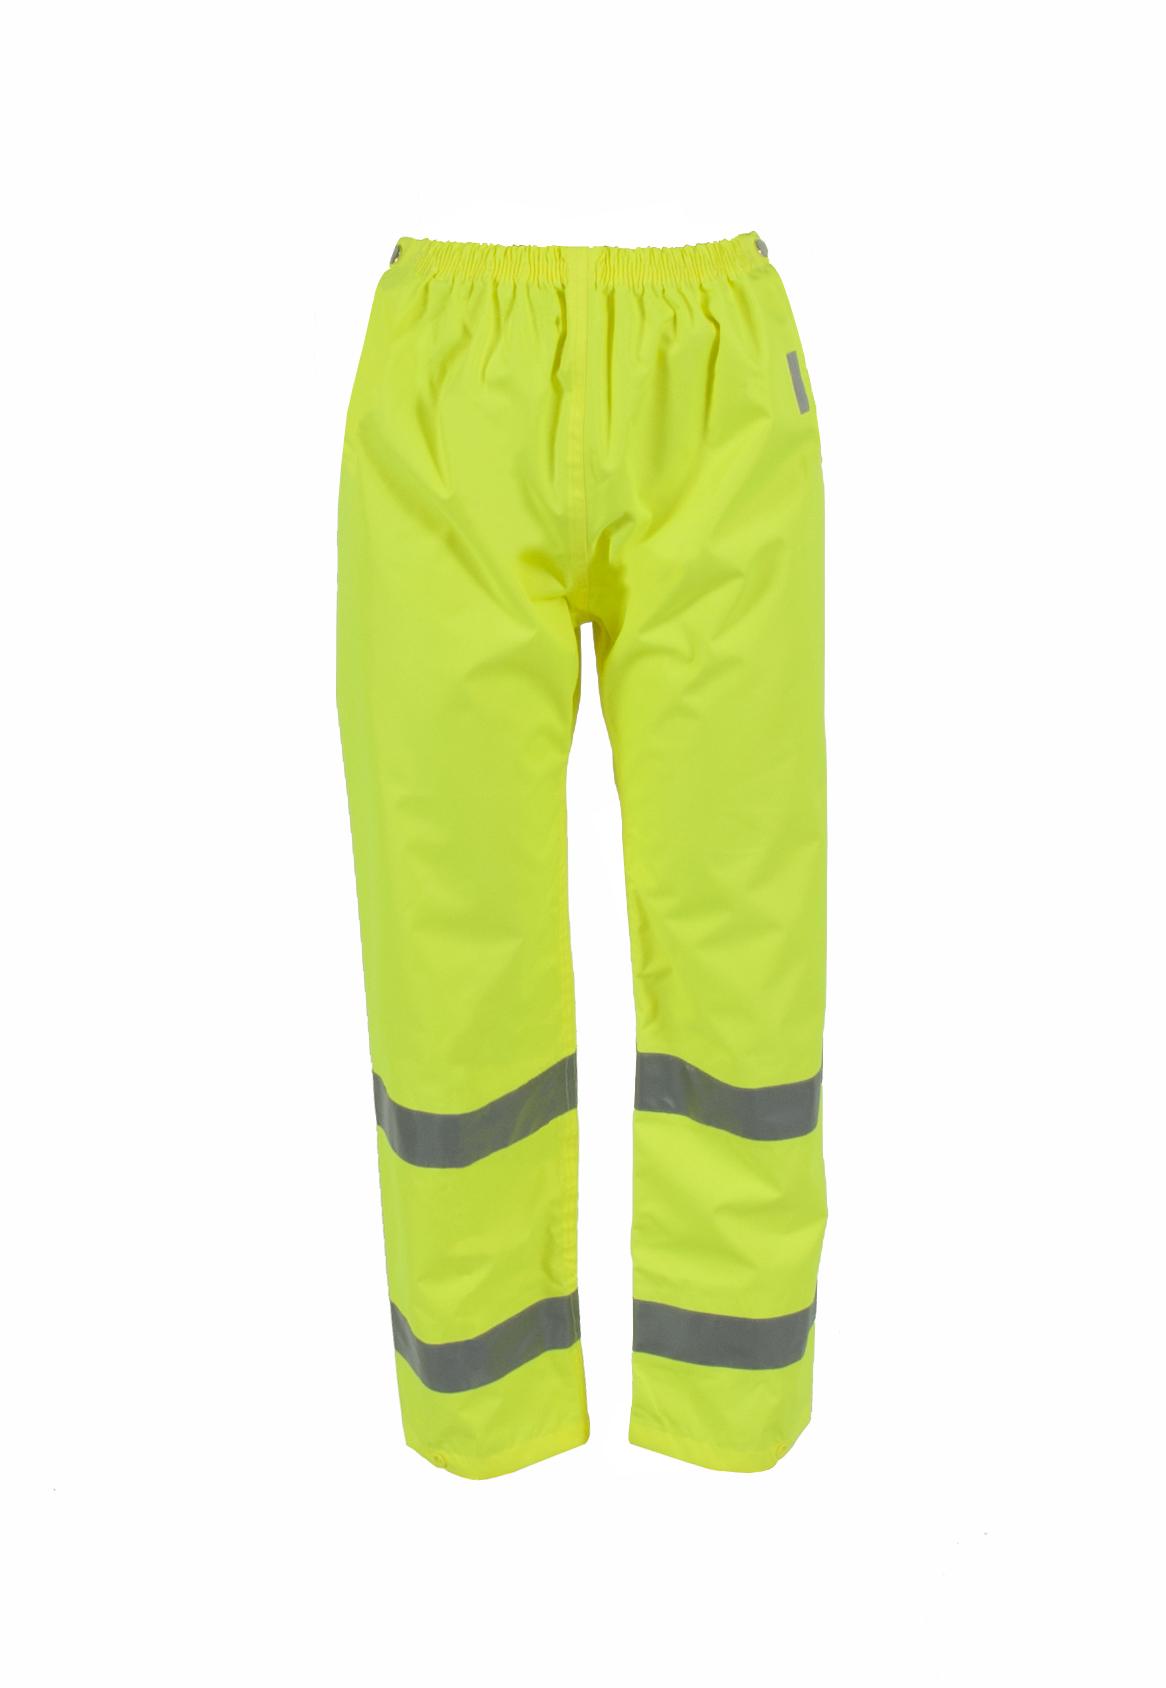 Neese Air Tex High Visibility Trousers| 9100ET-